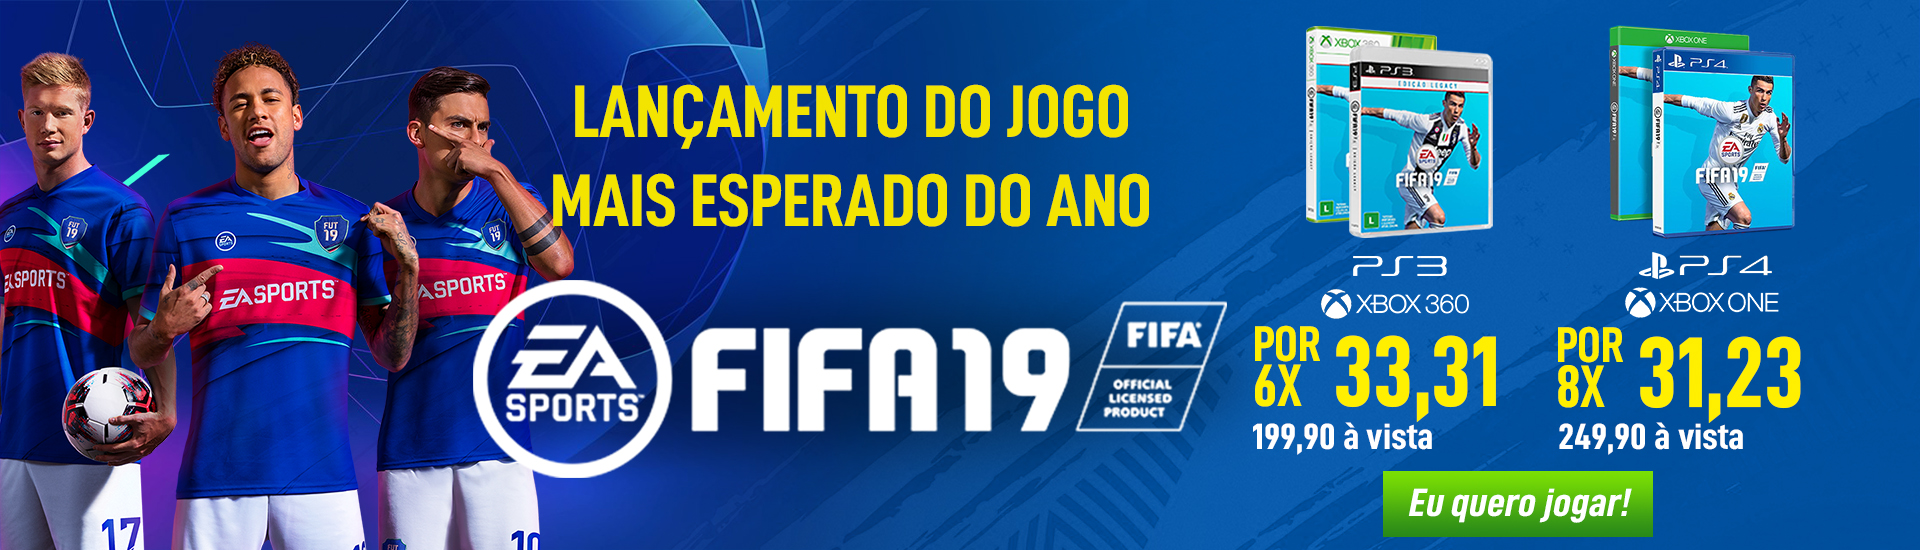 banner Fifa 2019